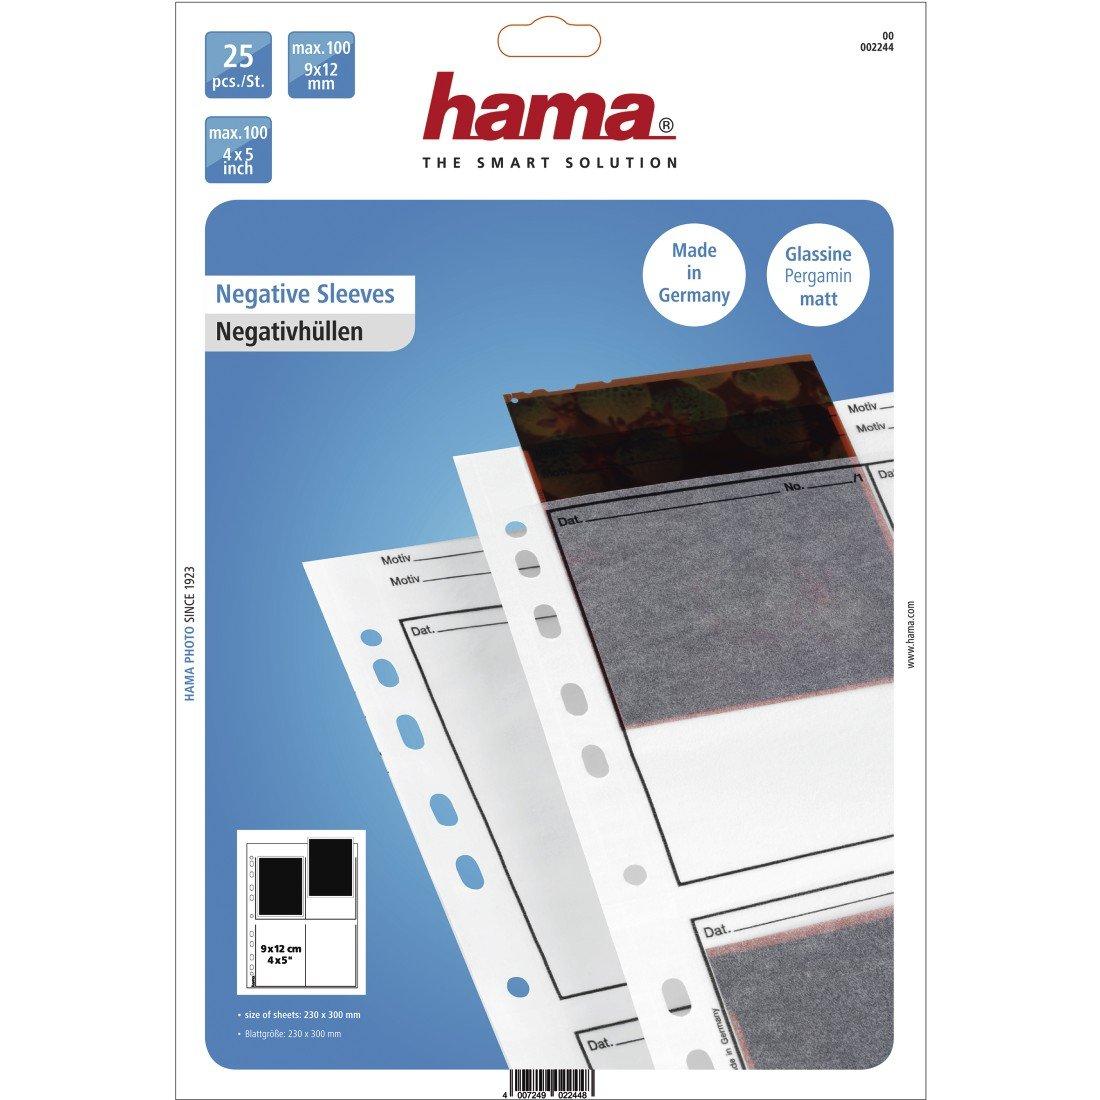 Hama Negative File Storage Sleeves, Each Holding 4 Single 9 x 12 cm Frames, Glassine (Pack of 25)